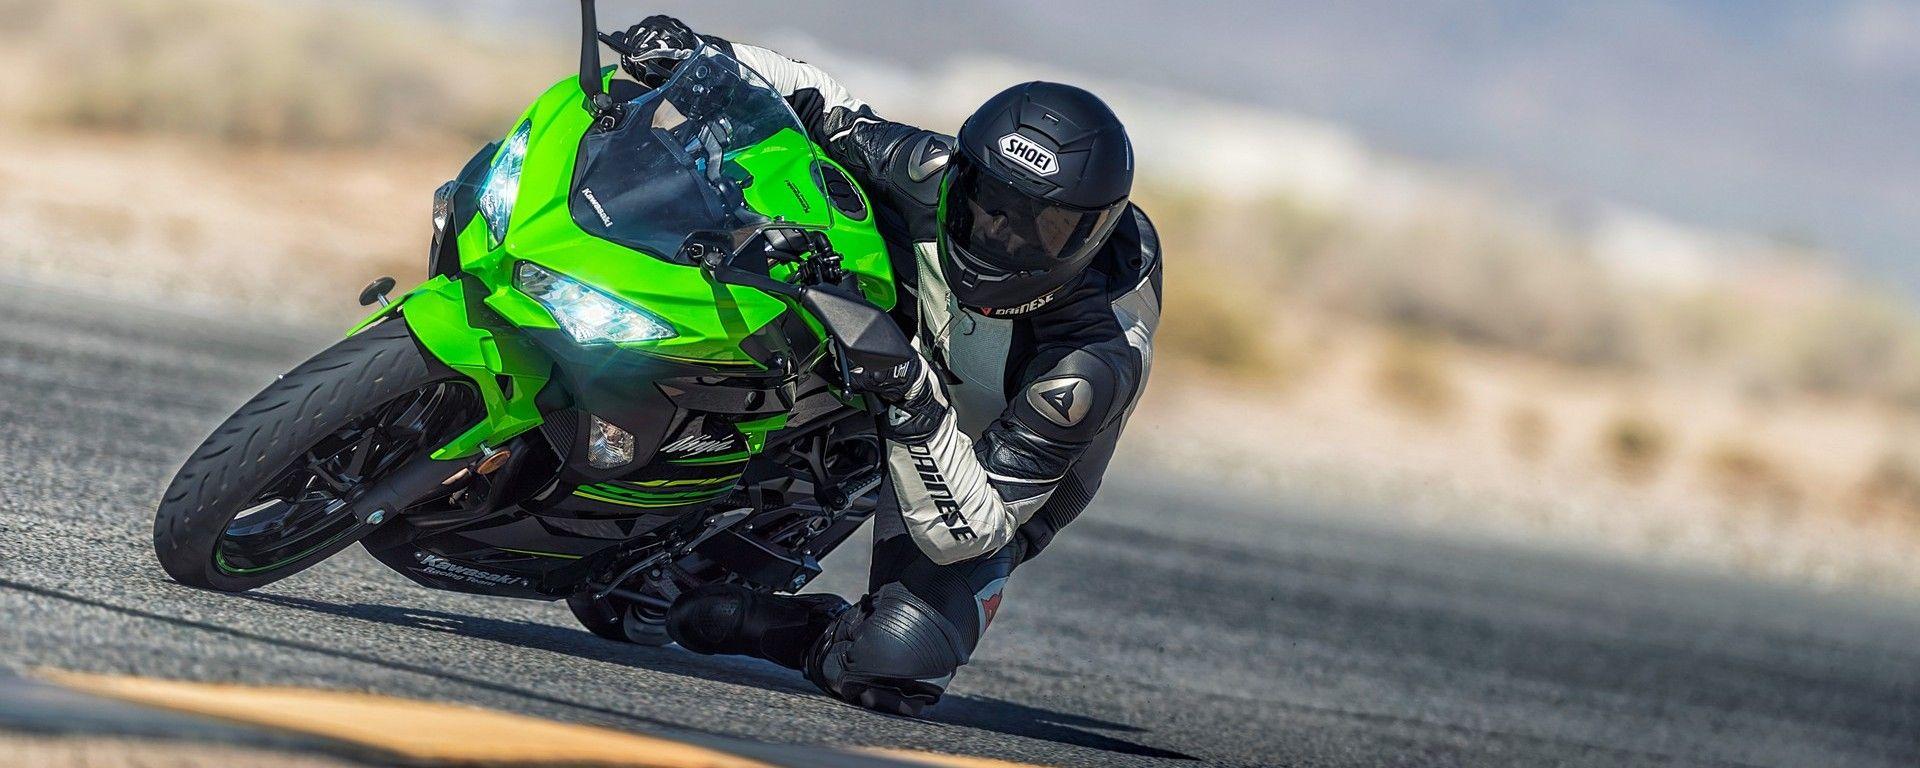 Nuova Kawasaki Ninja 400: correrà nei campionati superspot e MotoEstate